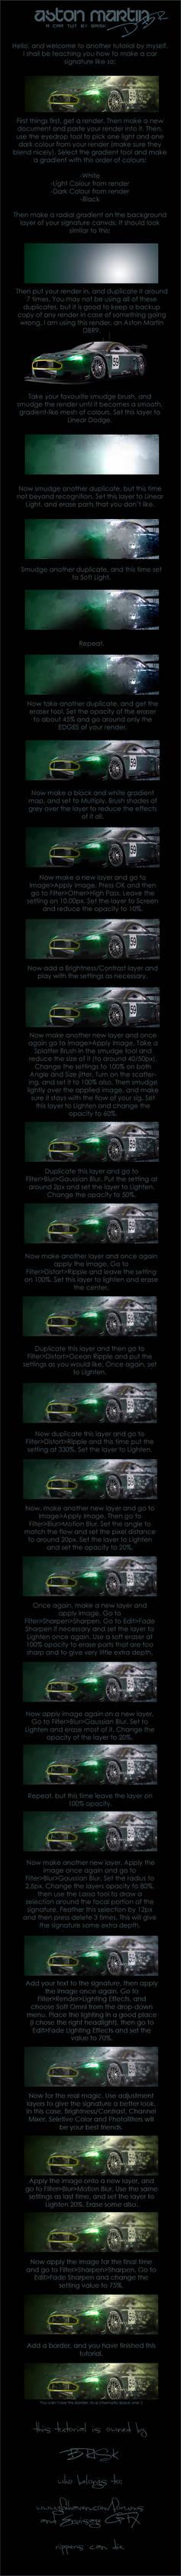 Aston Martin DBR9 Tutorial